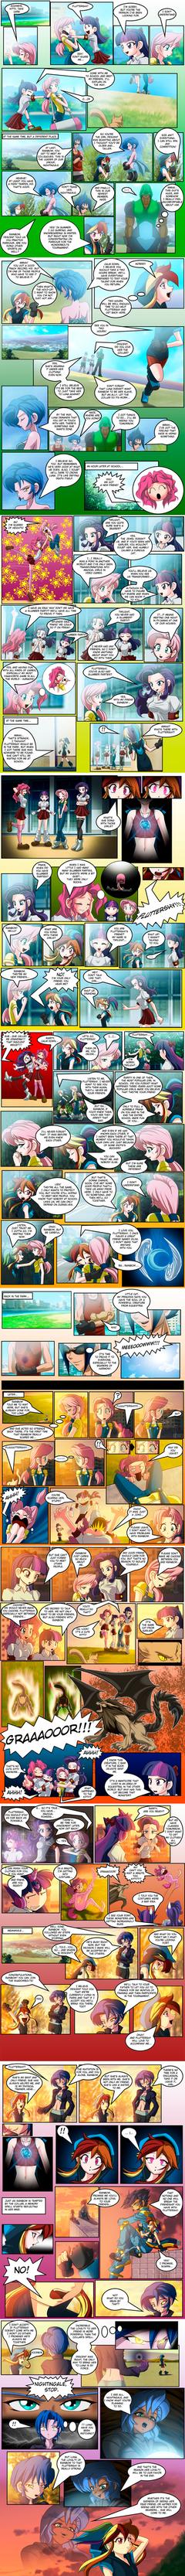 Friendship Is Magic 03 P3 by mauroz